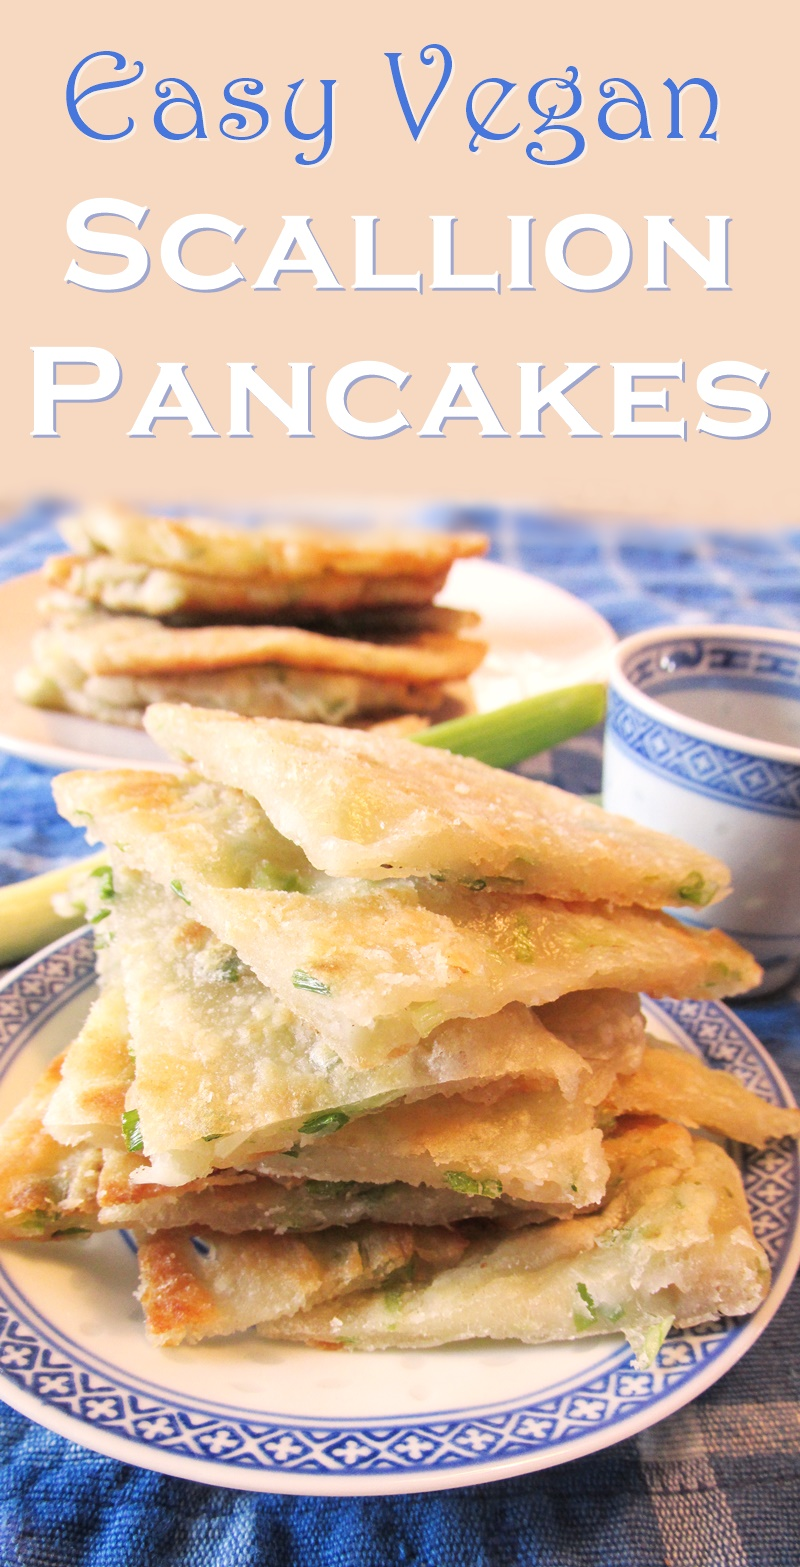 Scallion Pancakes Recipe - Easy, Naturally Vegan and Kid-Friendly